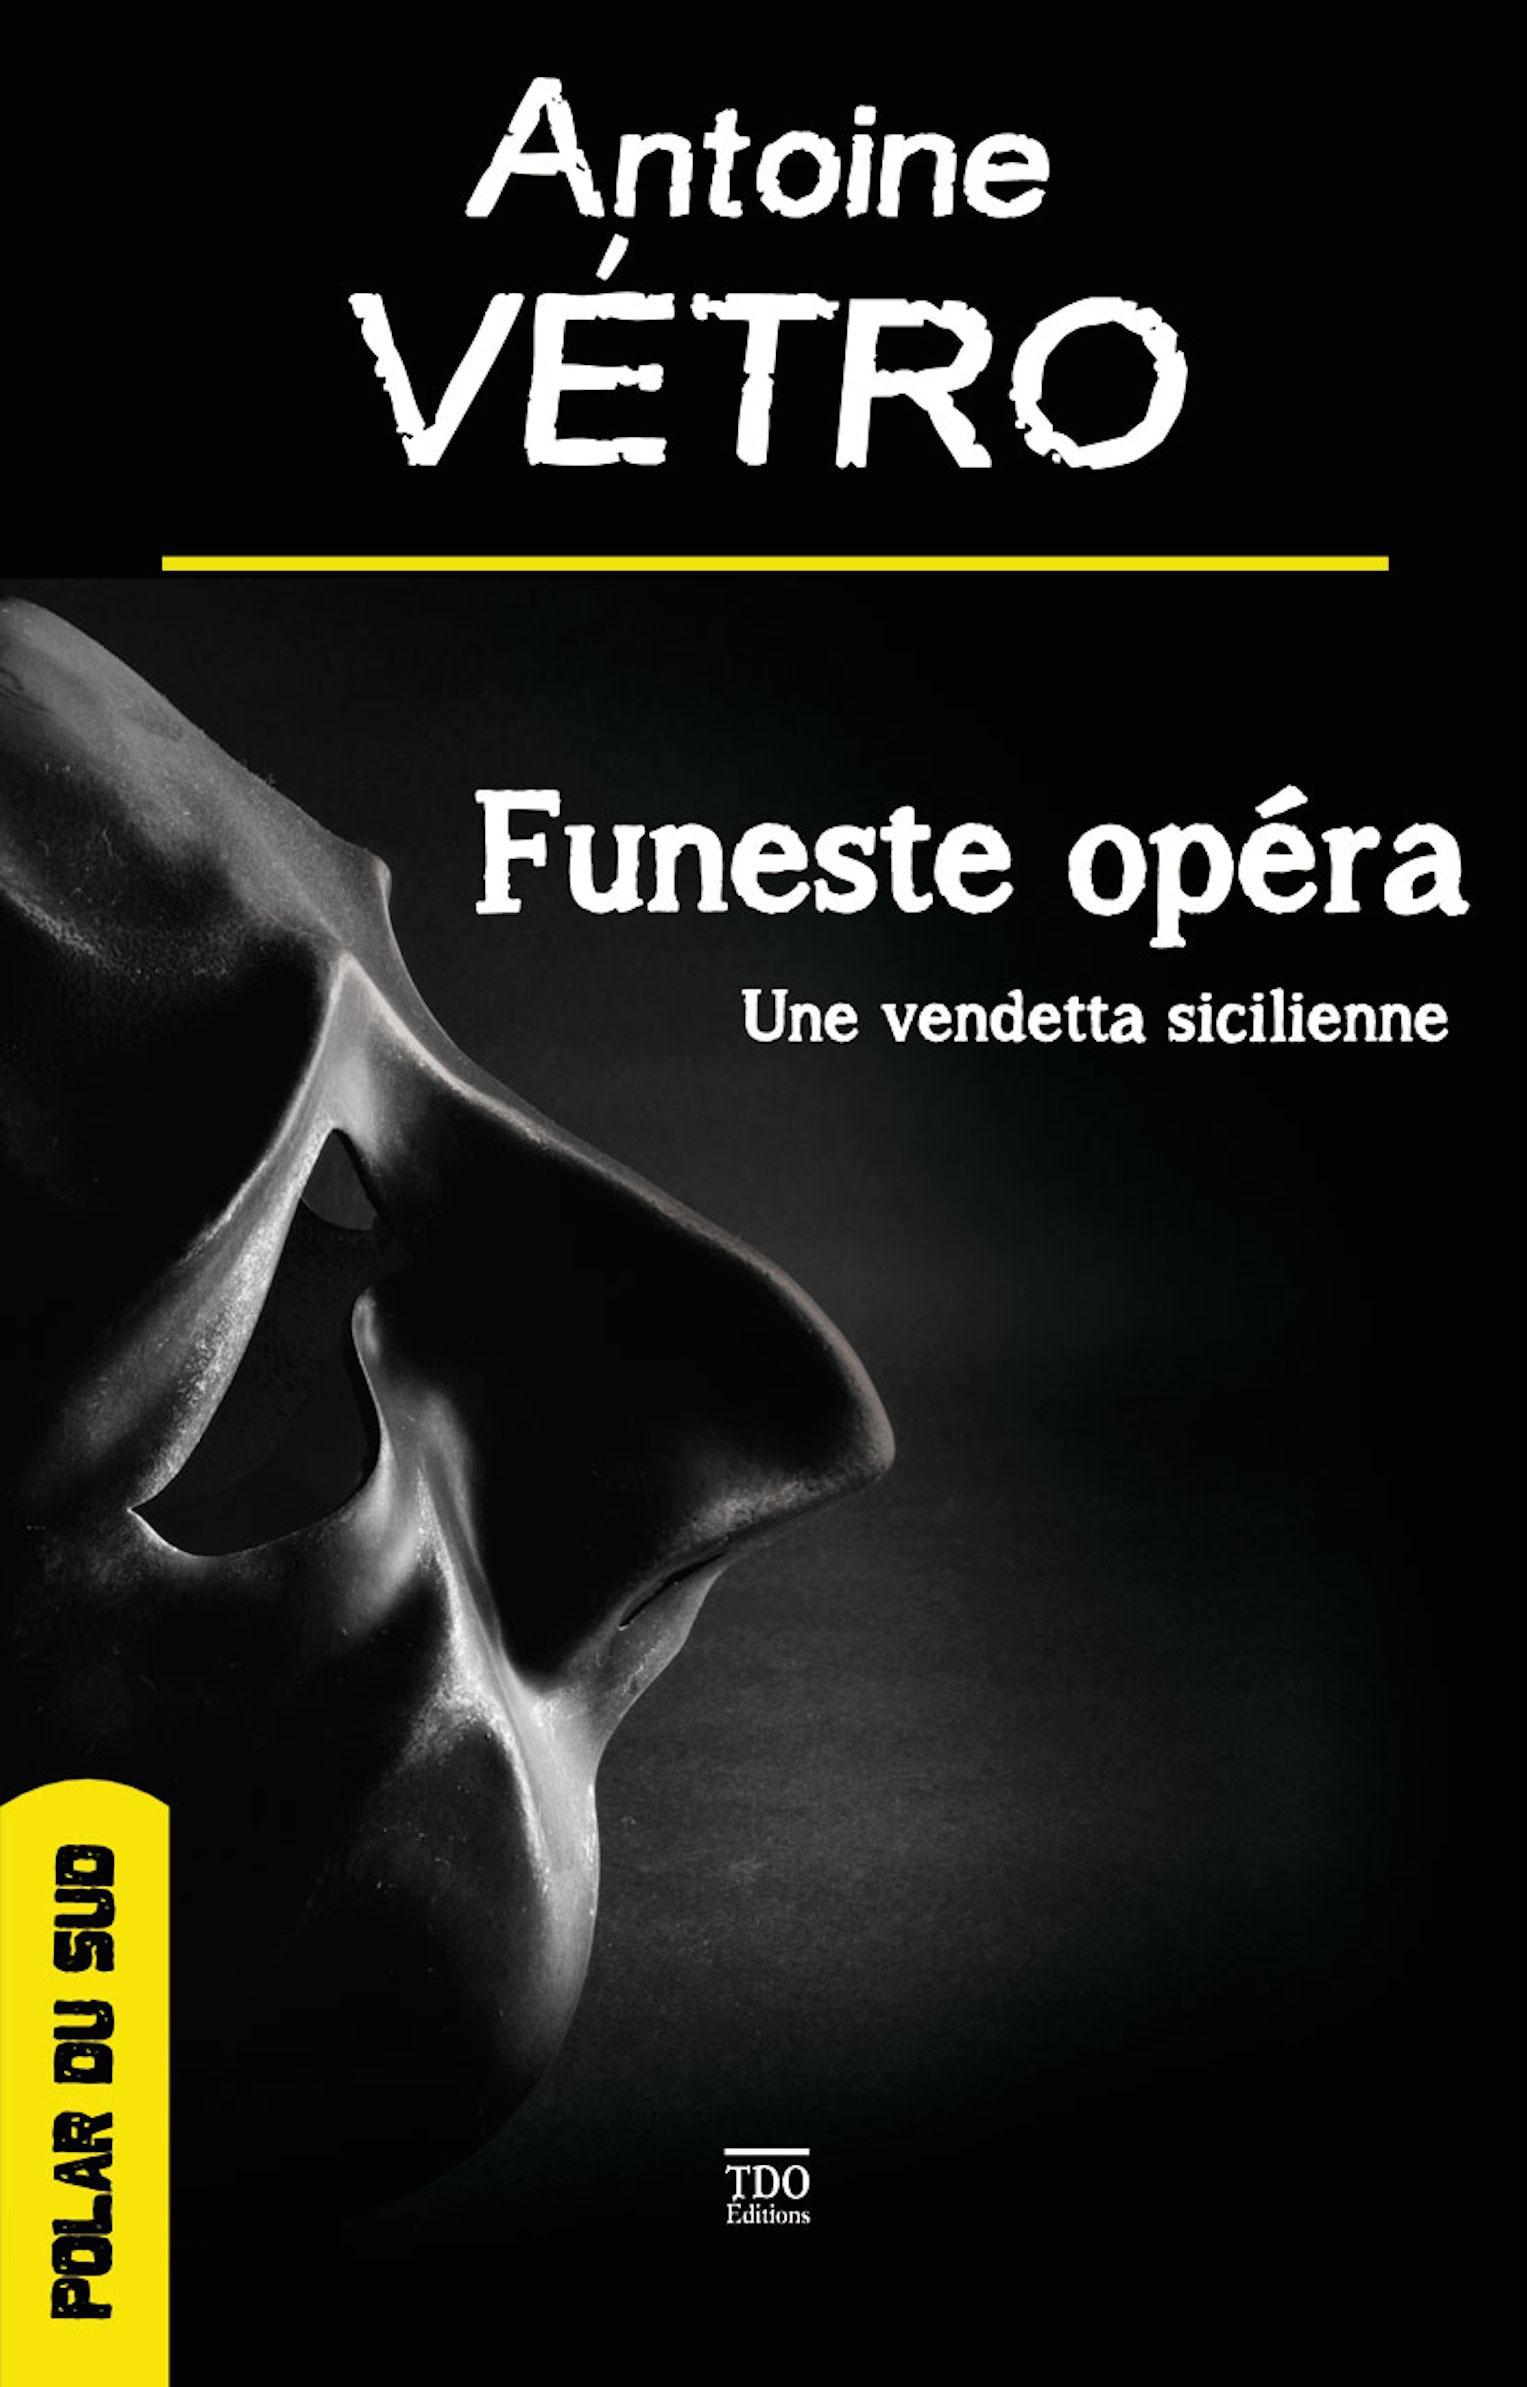 Funeste opéra ; une vendetta sicilienne